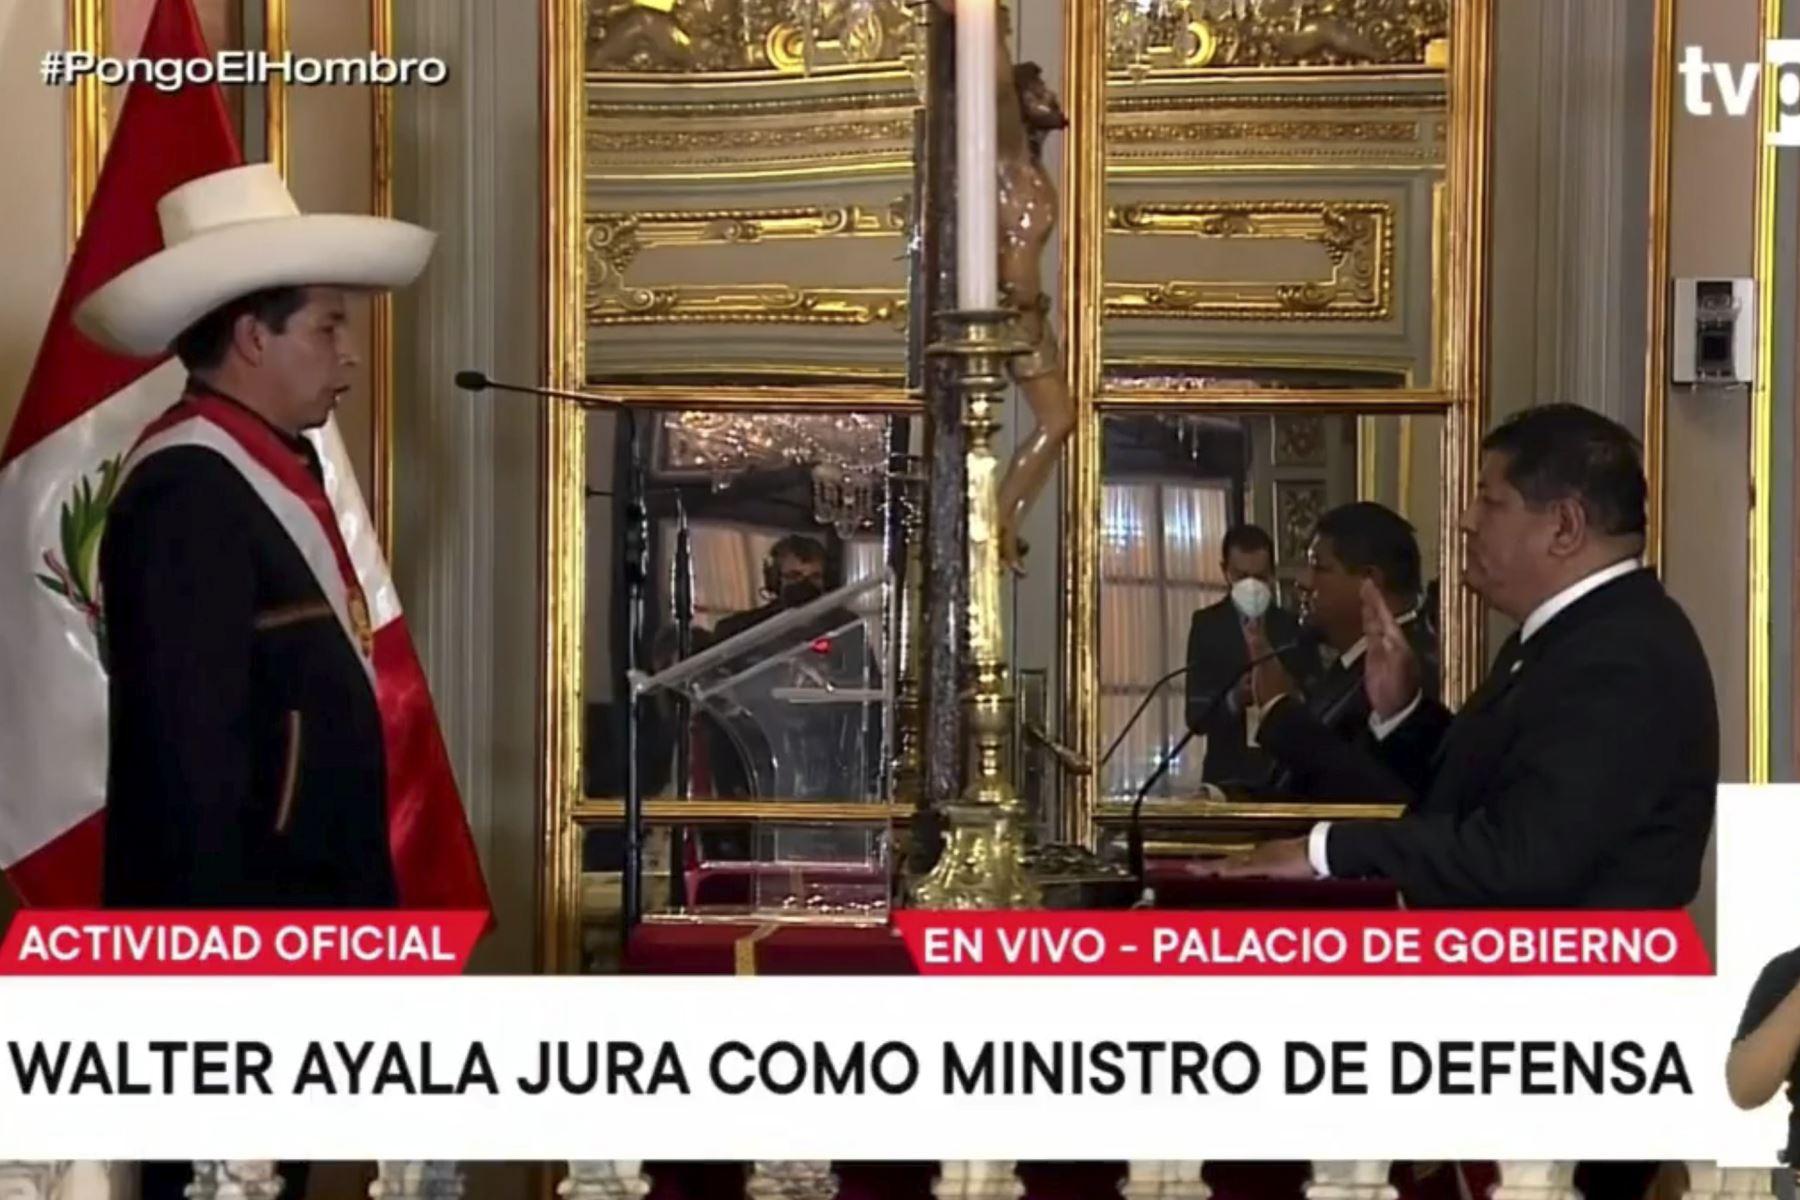 Walter Ayala jura como ministro de Defensa